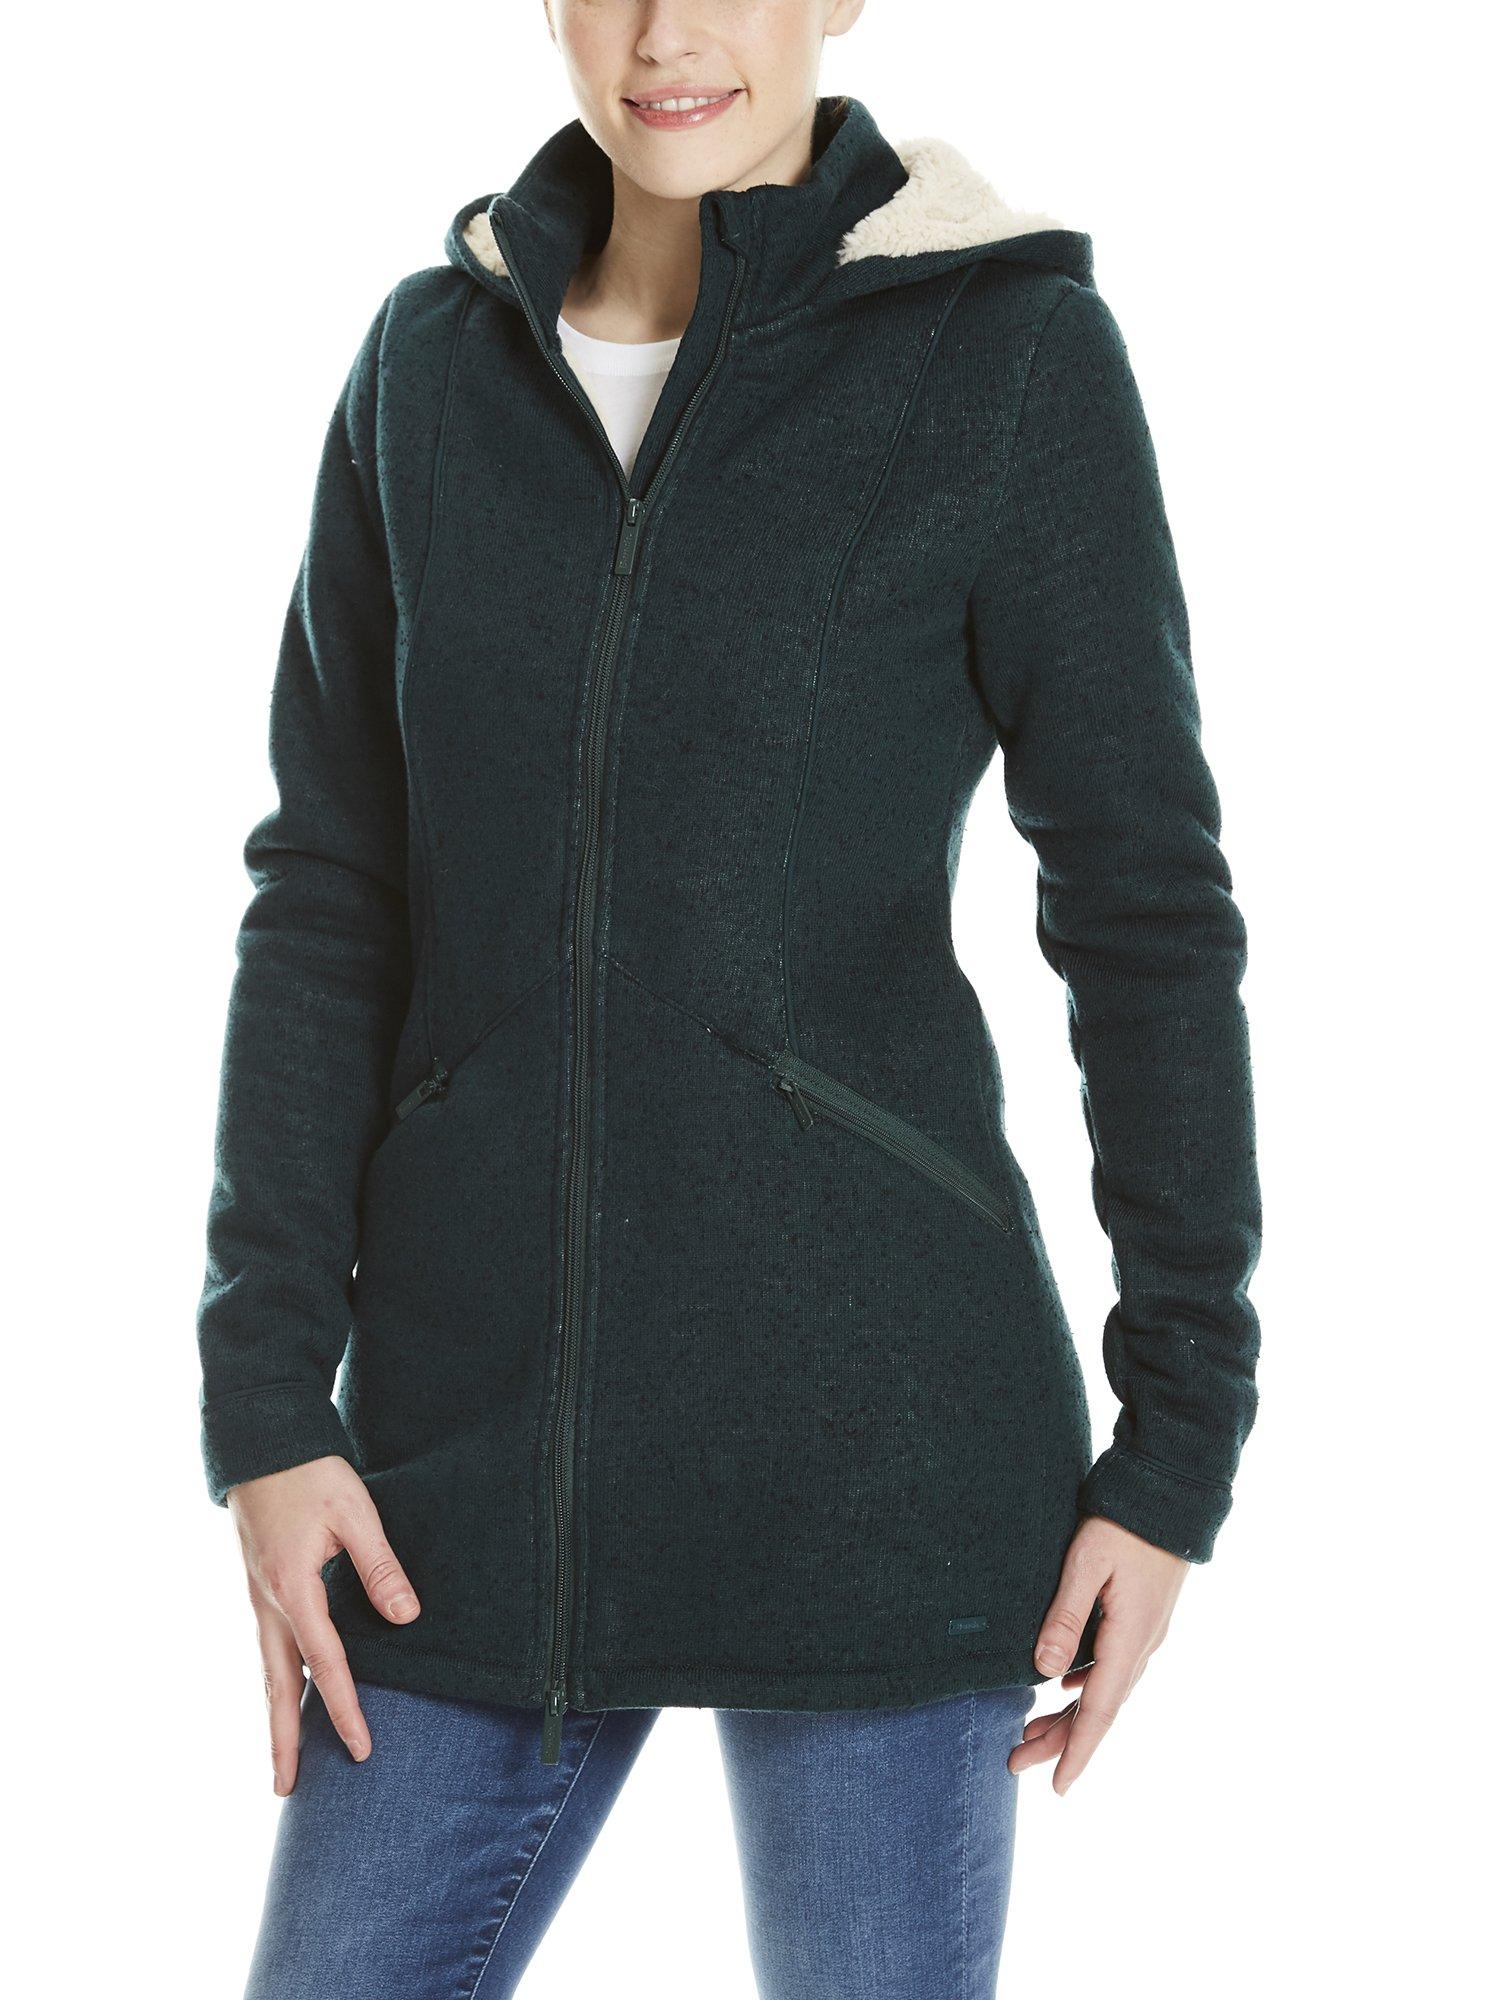 Green Teddy Jacket Long Bench Gr163Large SweatVertdark Bonded Veste Femme gb76fy